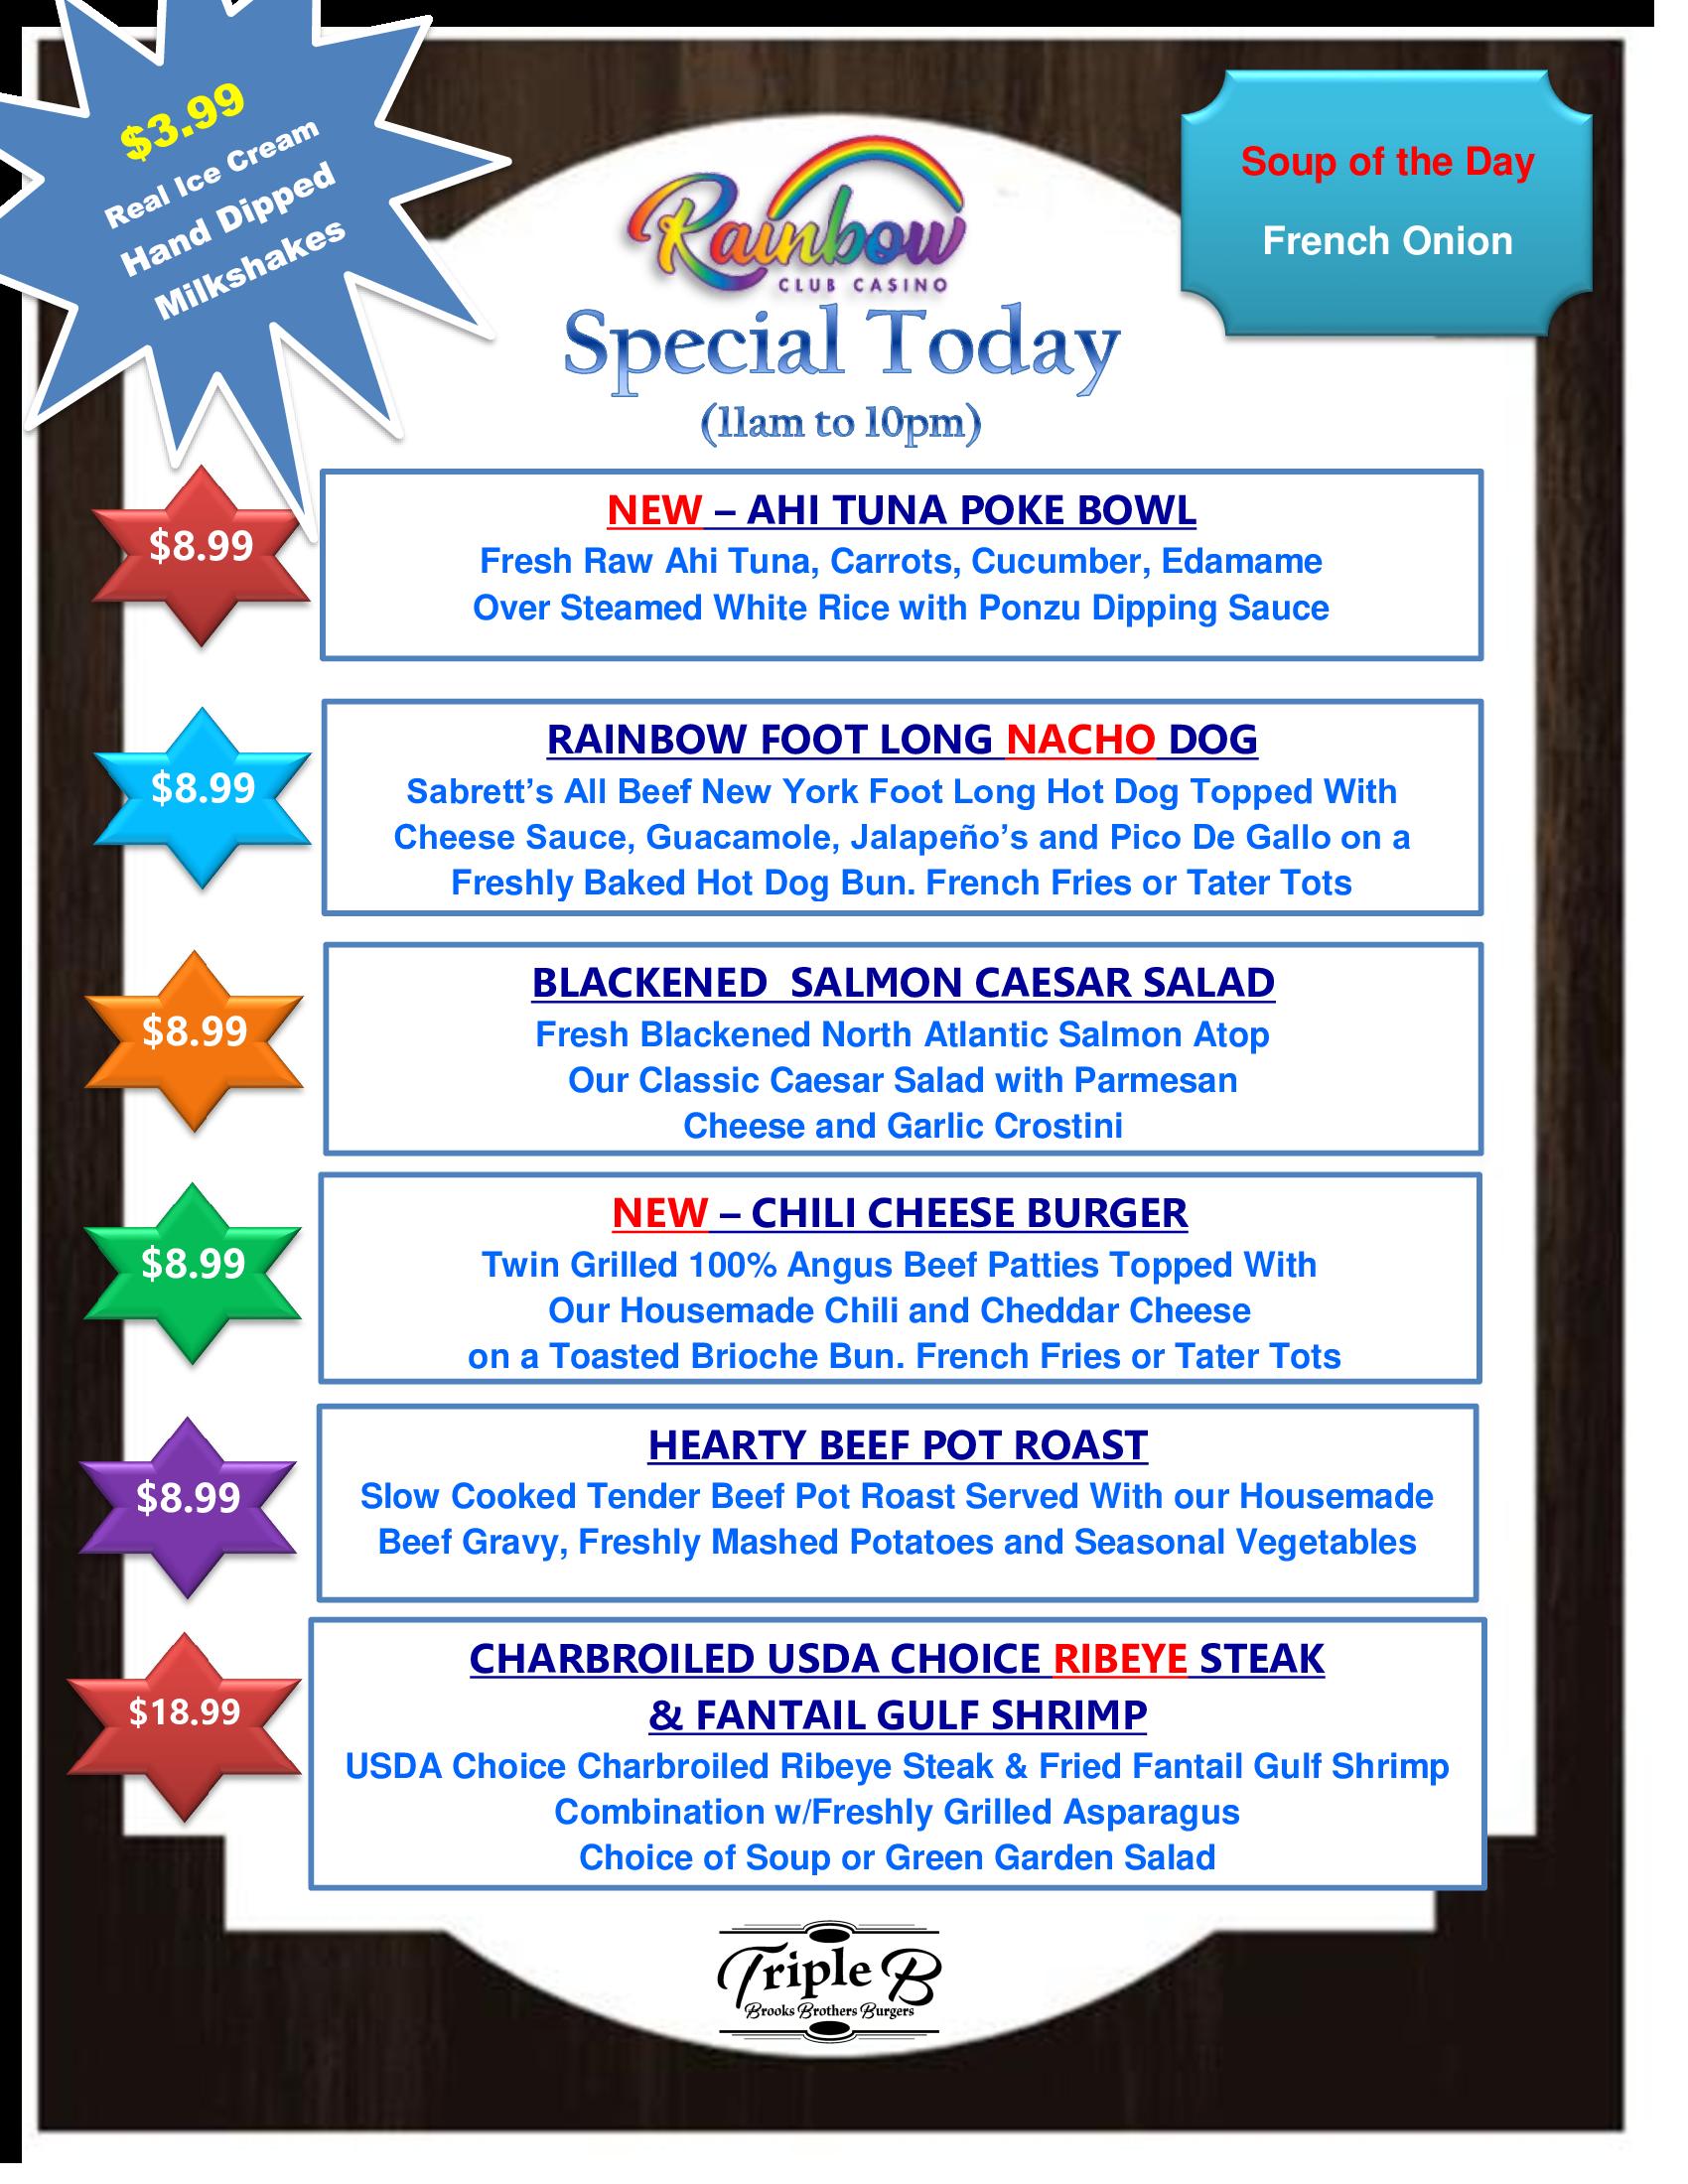 Daily Specials THURSDAY 09-16-21